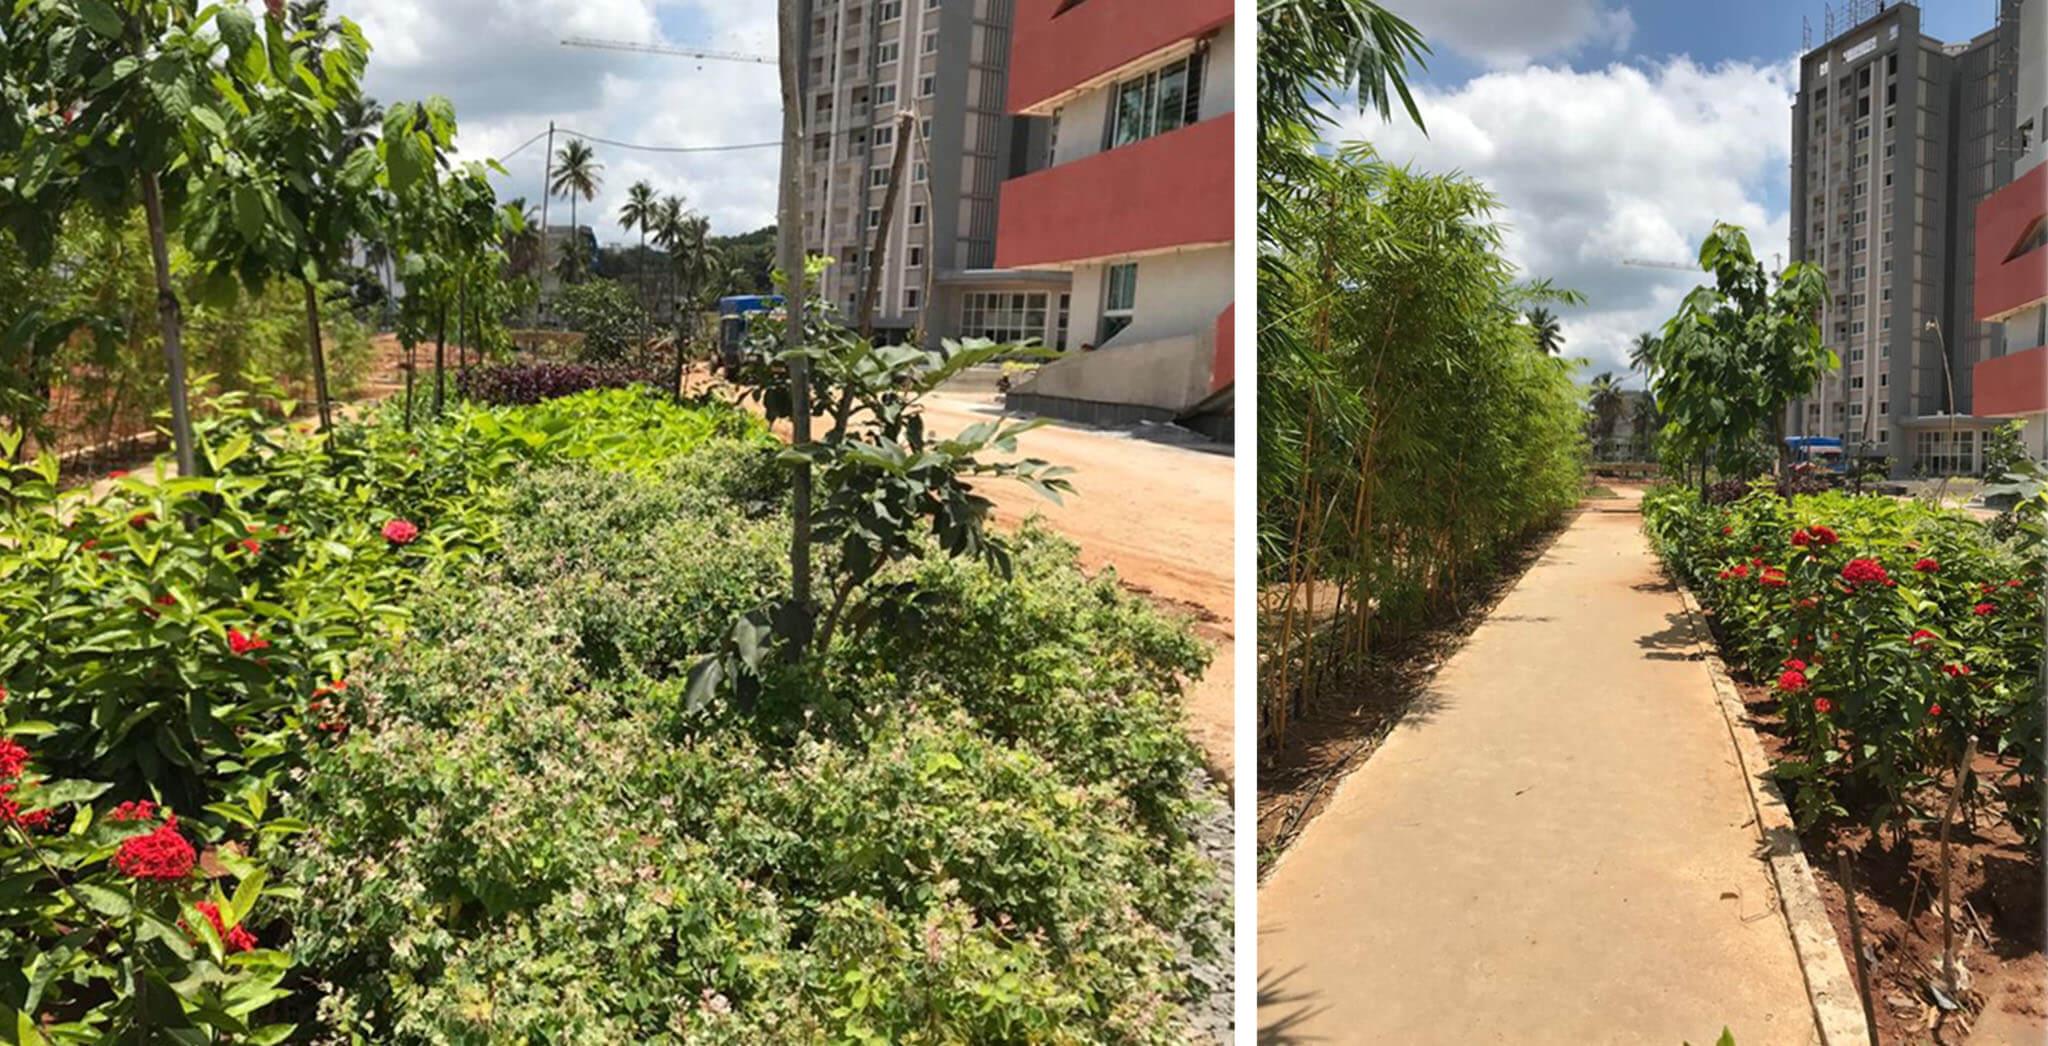 Oct 2020 - Entrance landscaping in progress